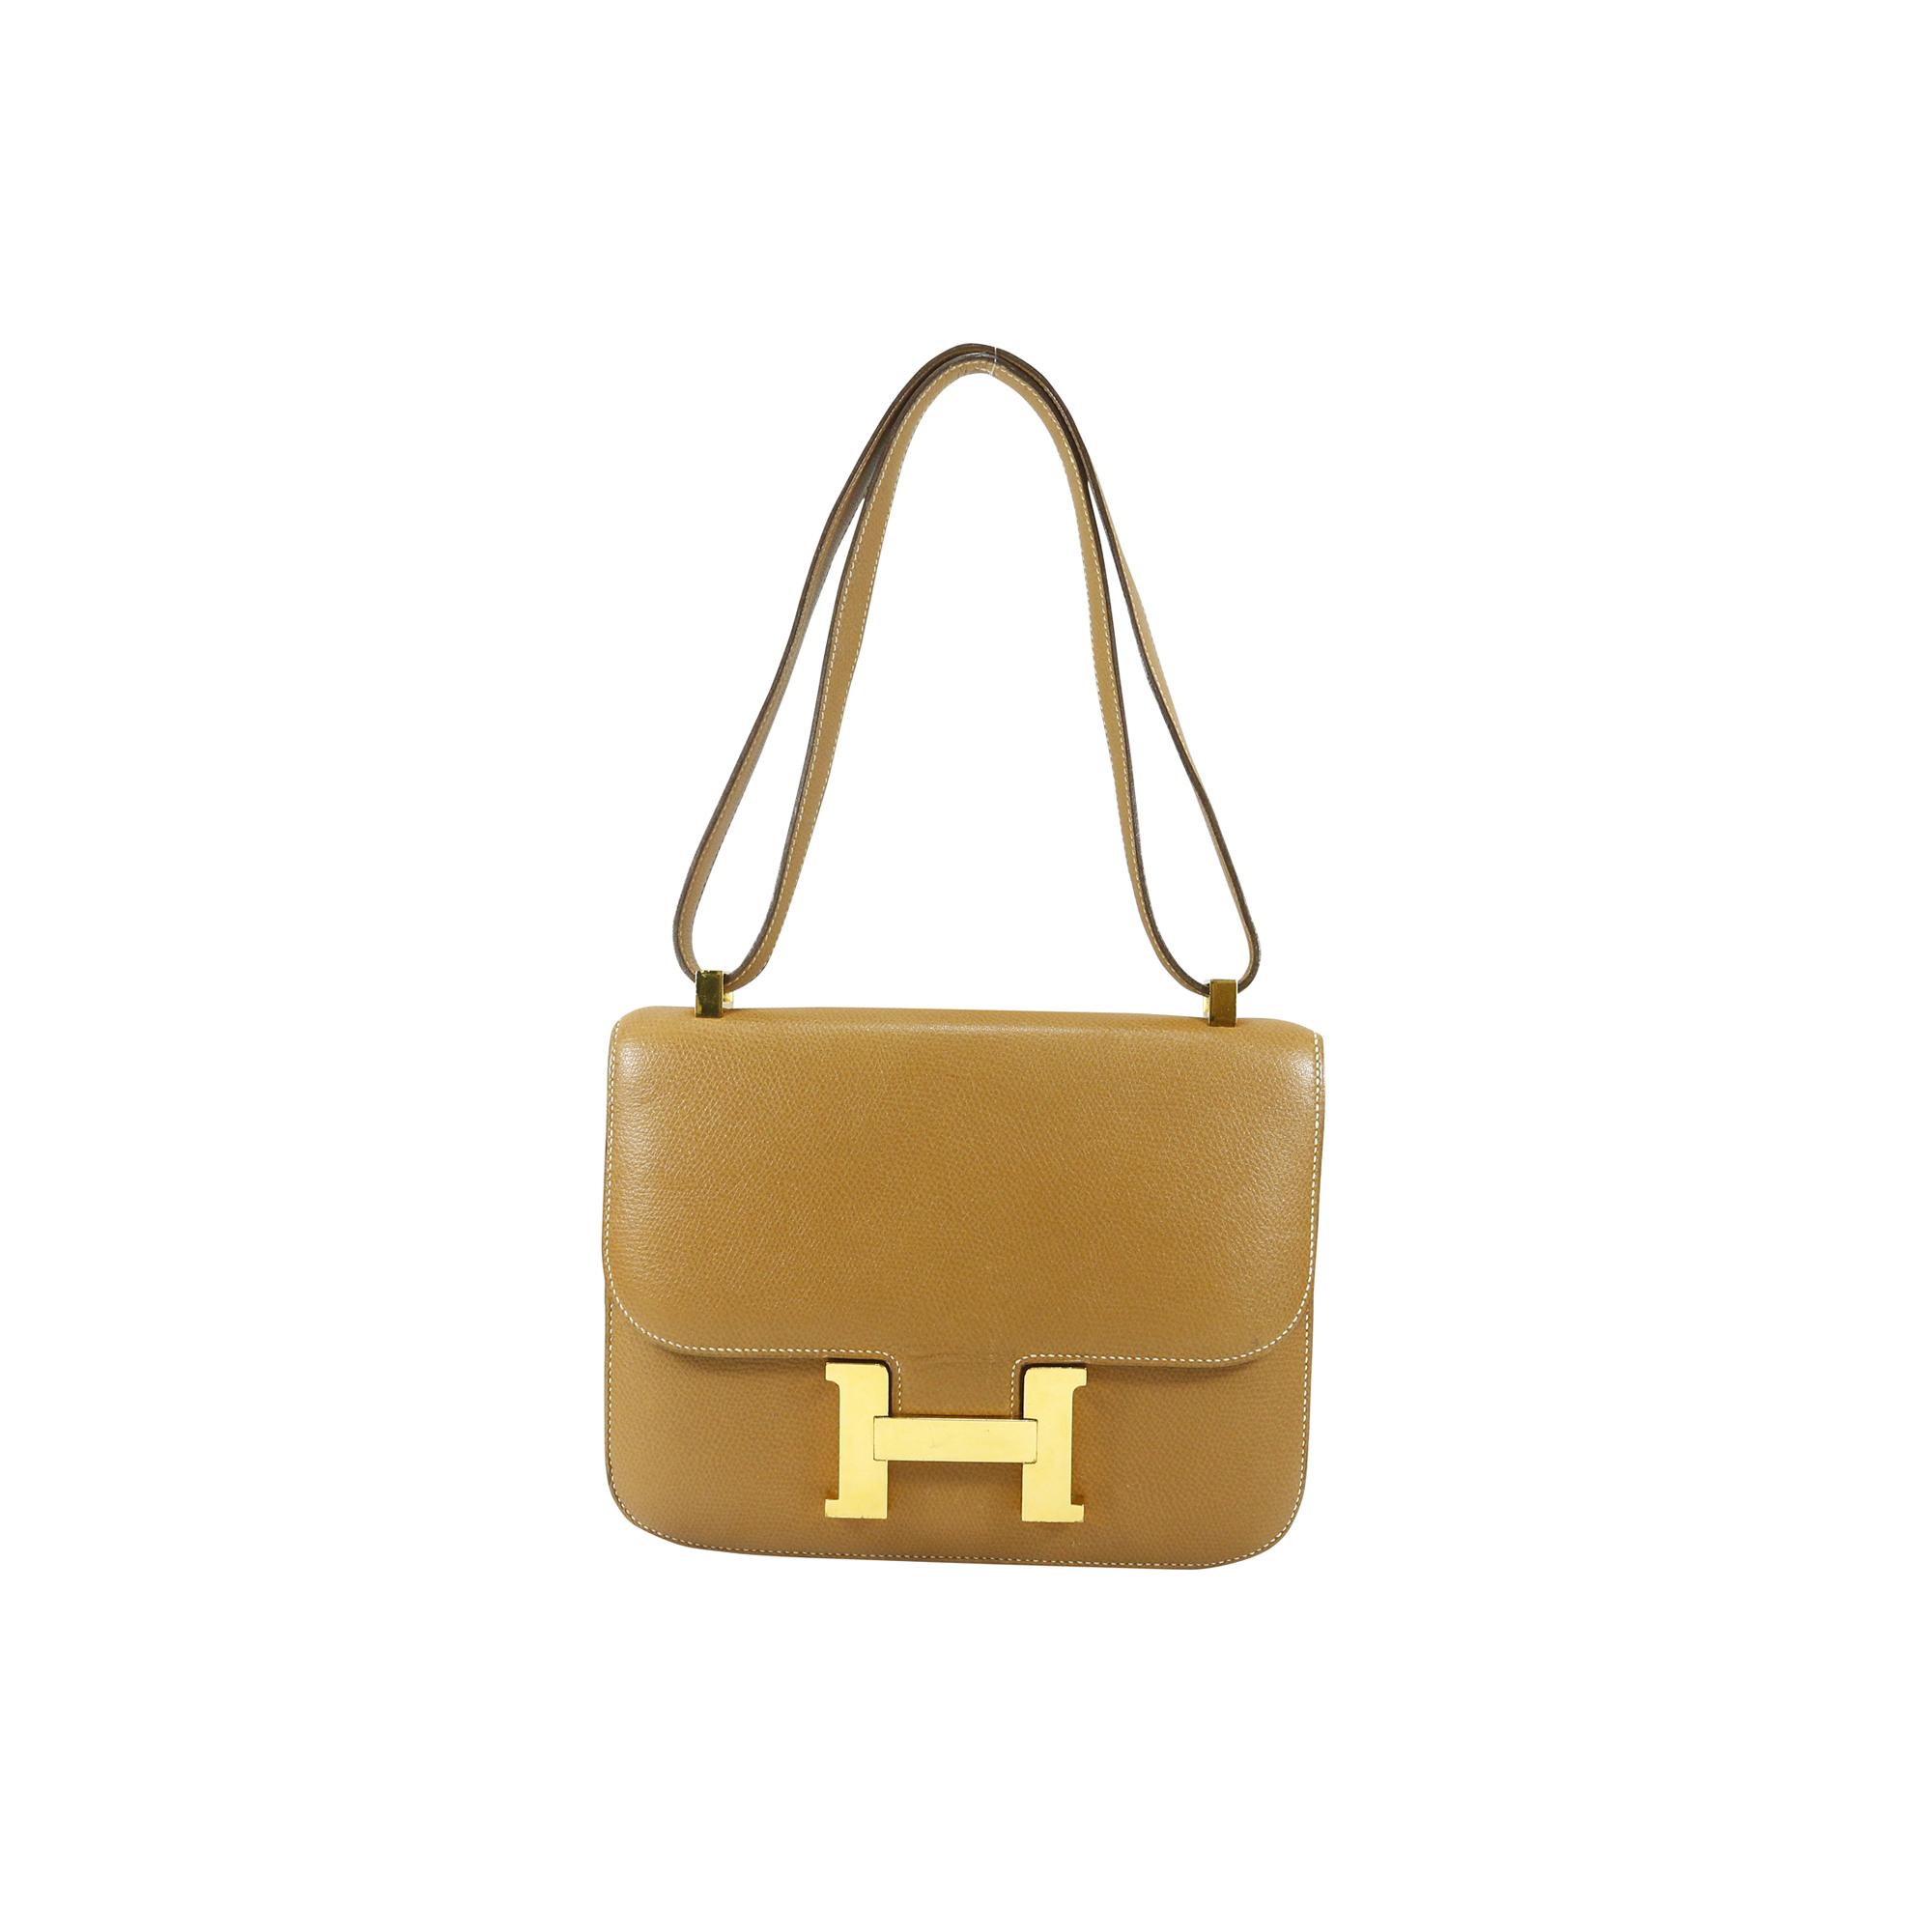 9c05918d930d ... italy second hand hermes vintage constance bag the fifth collection  89d60 5d1e9 ...